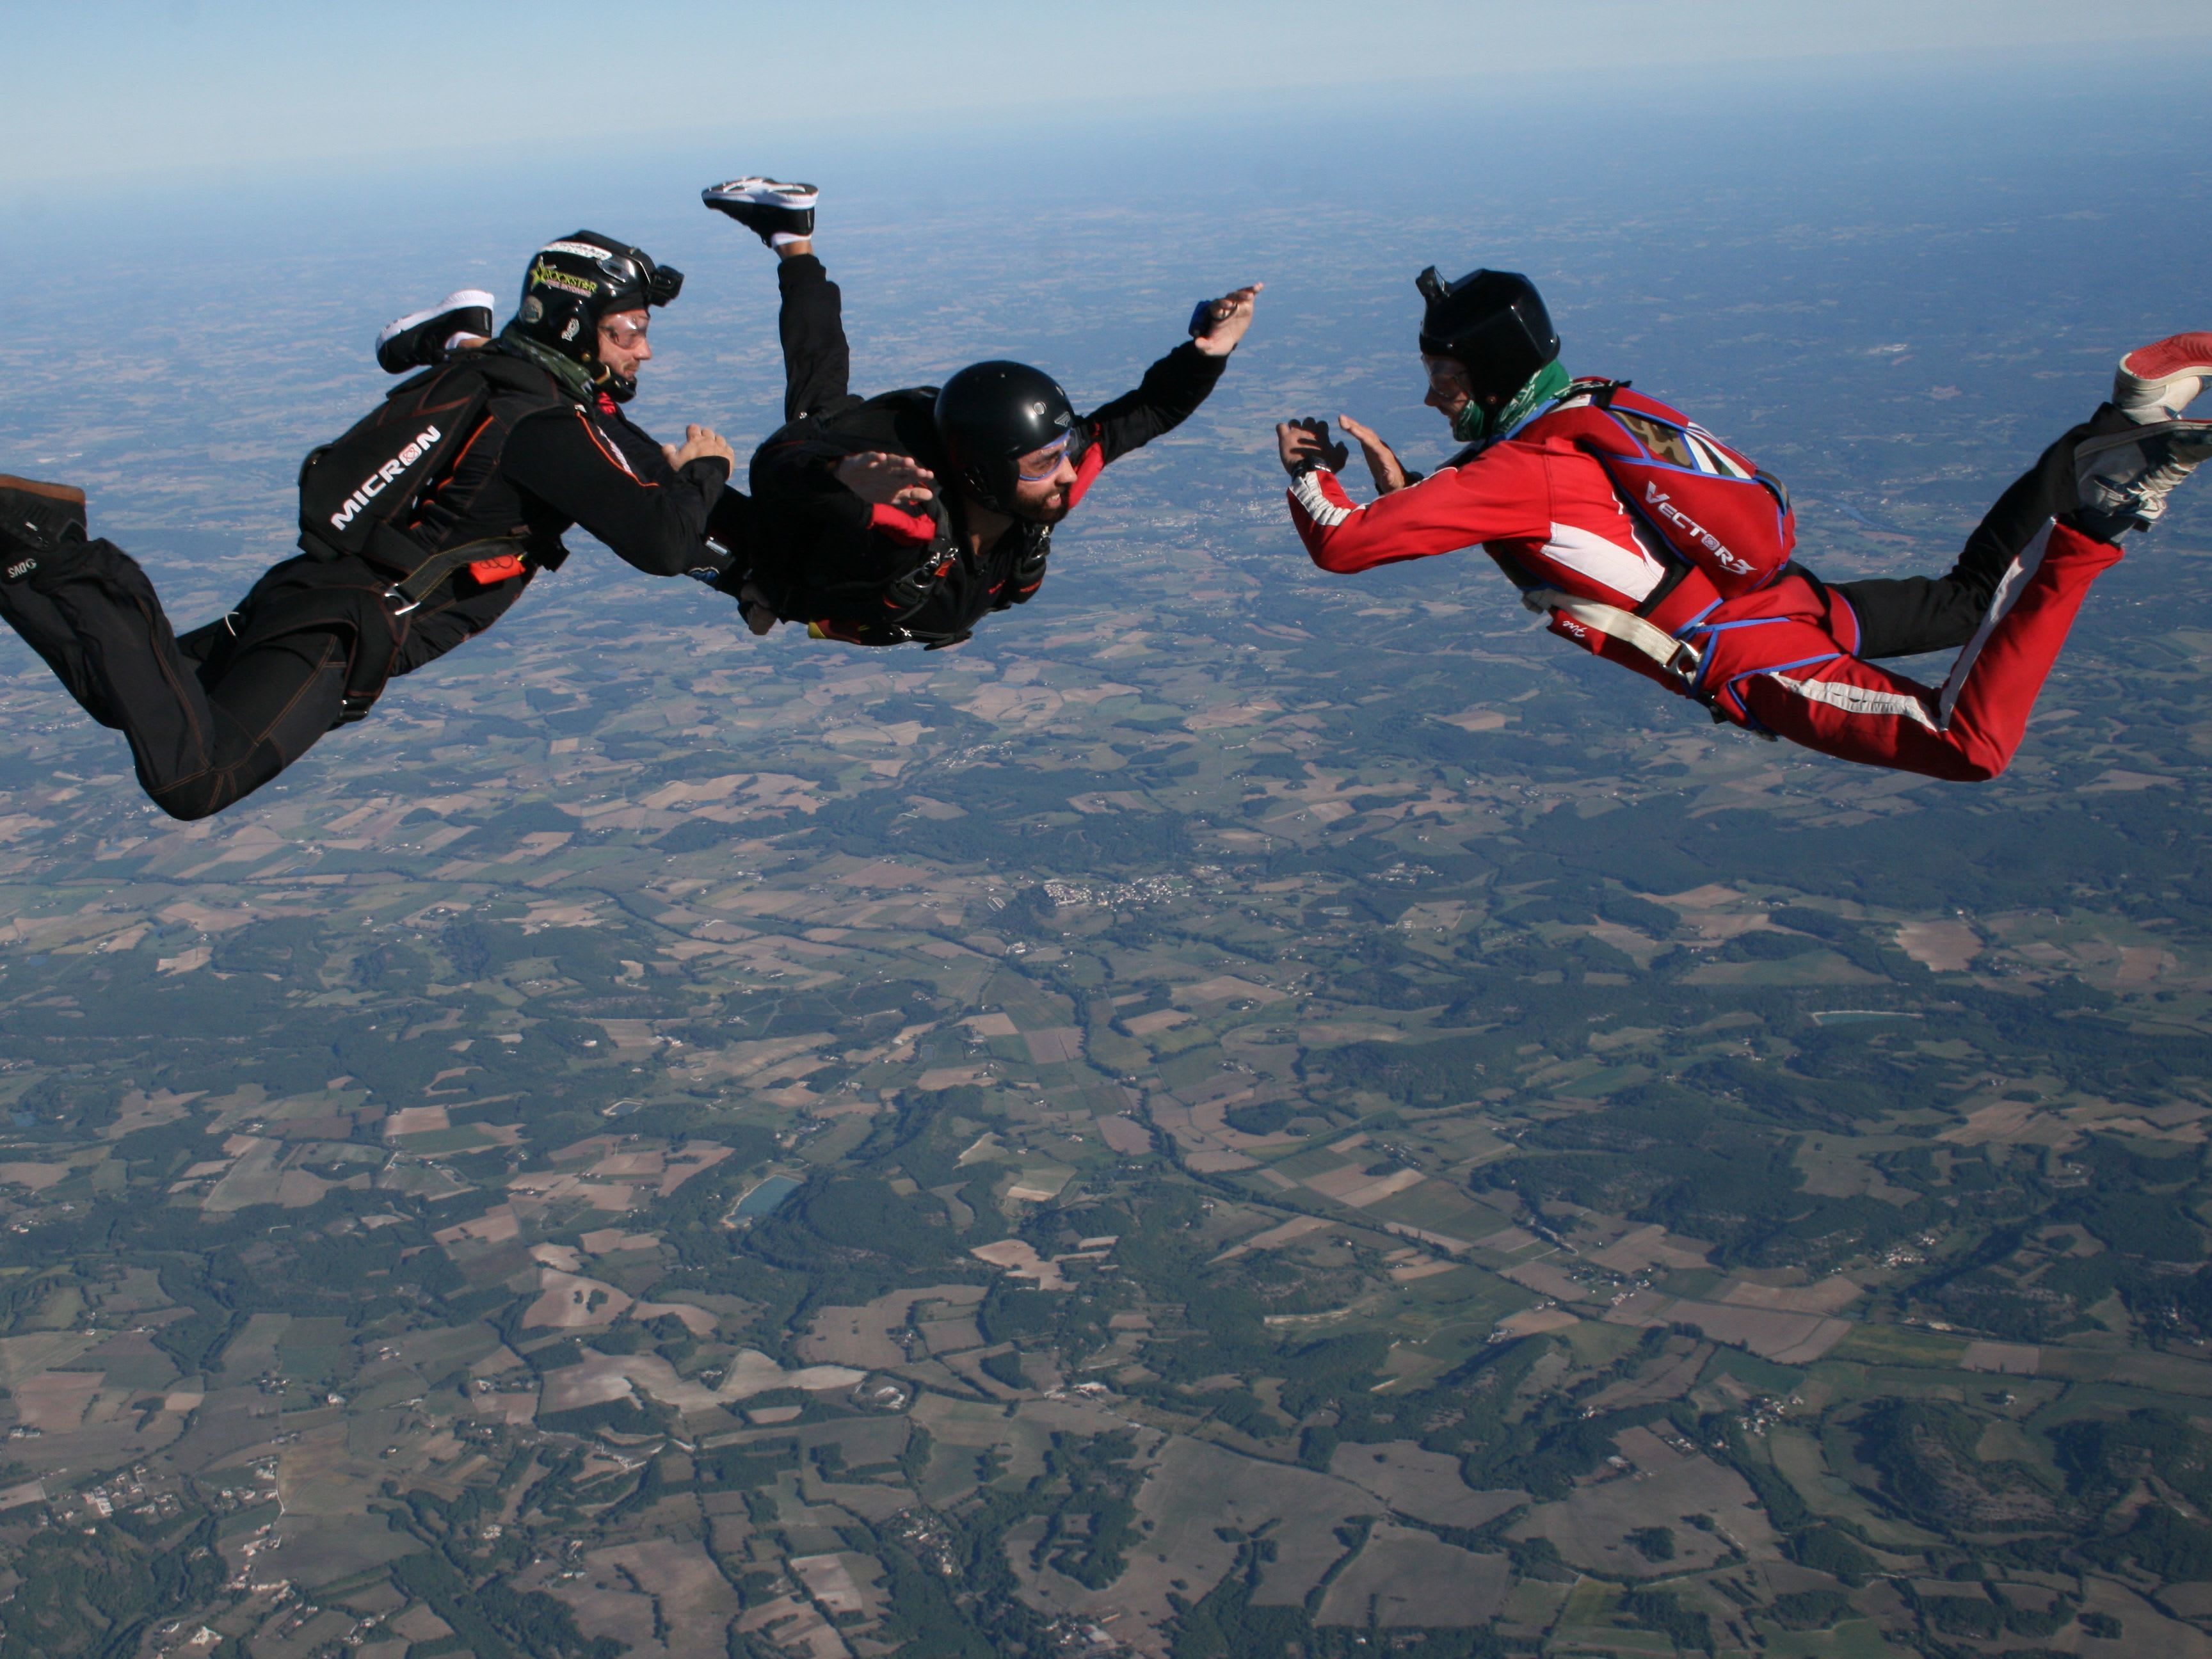 Sauter en parachute seul